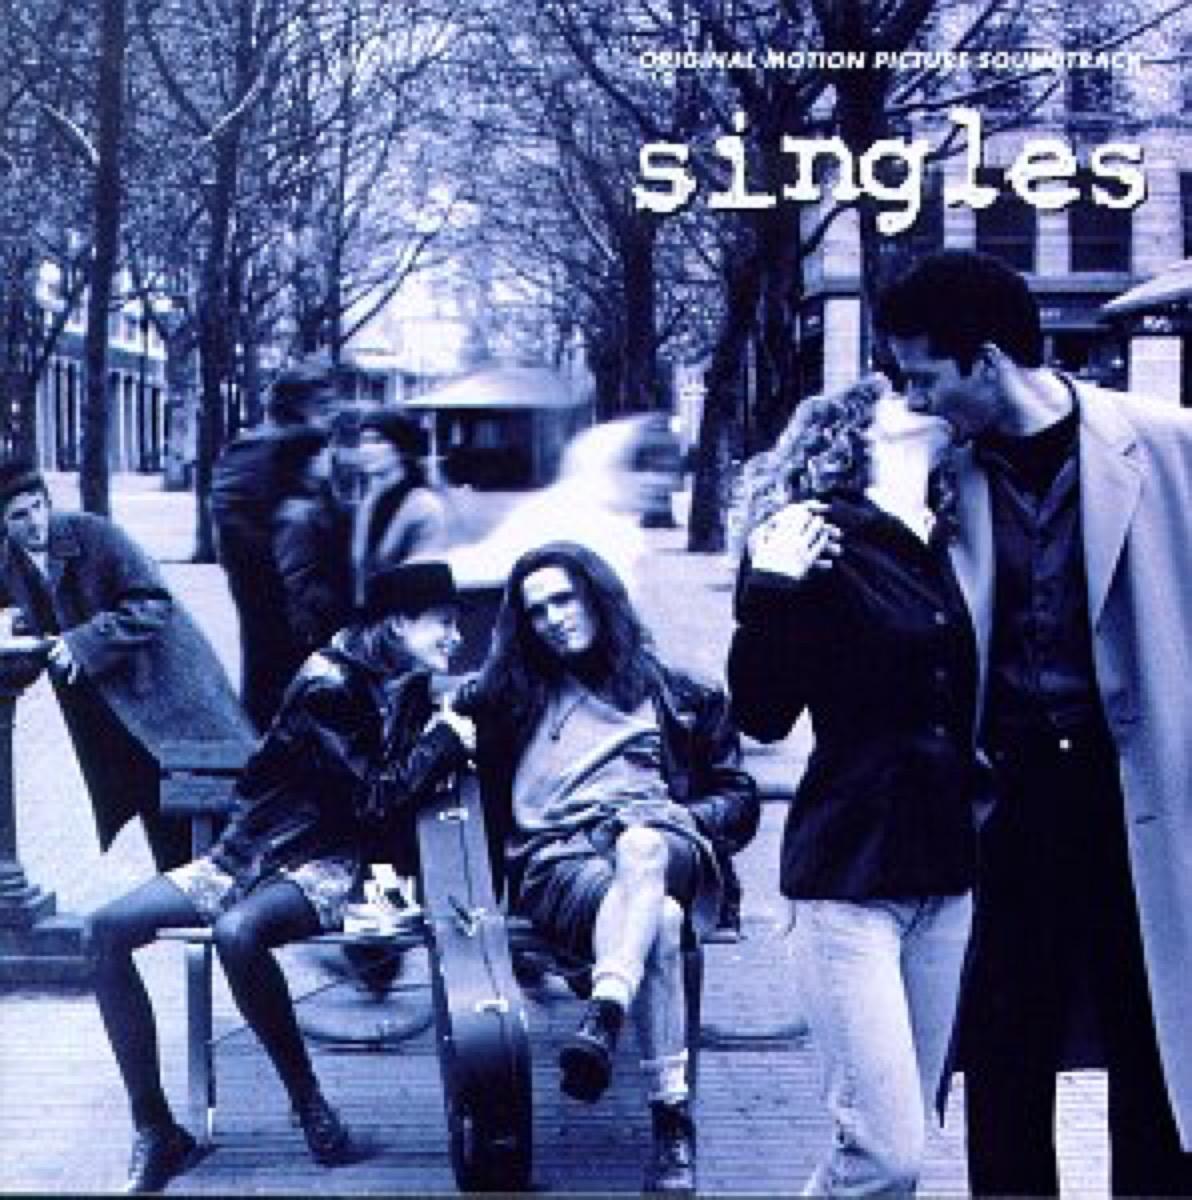 singles movie soundtrack album cover